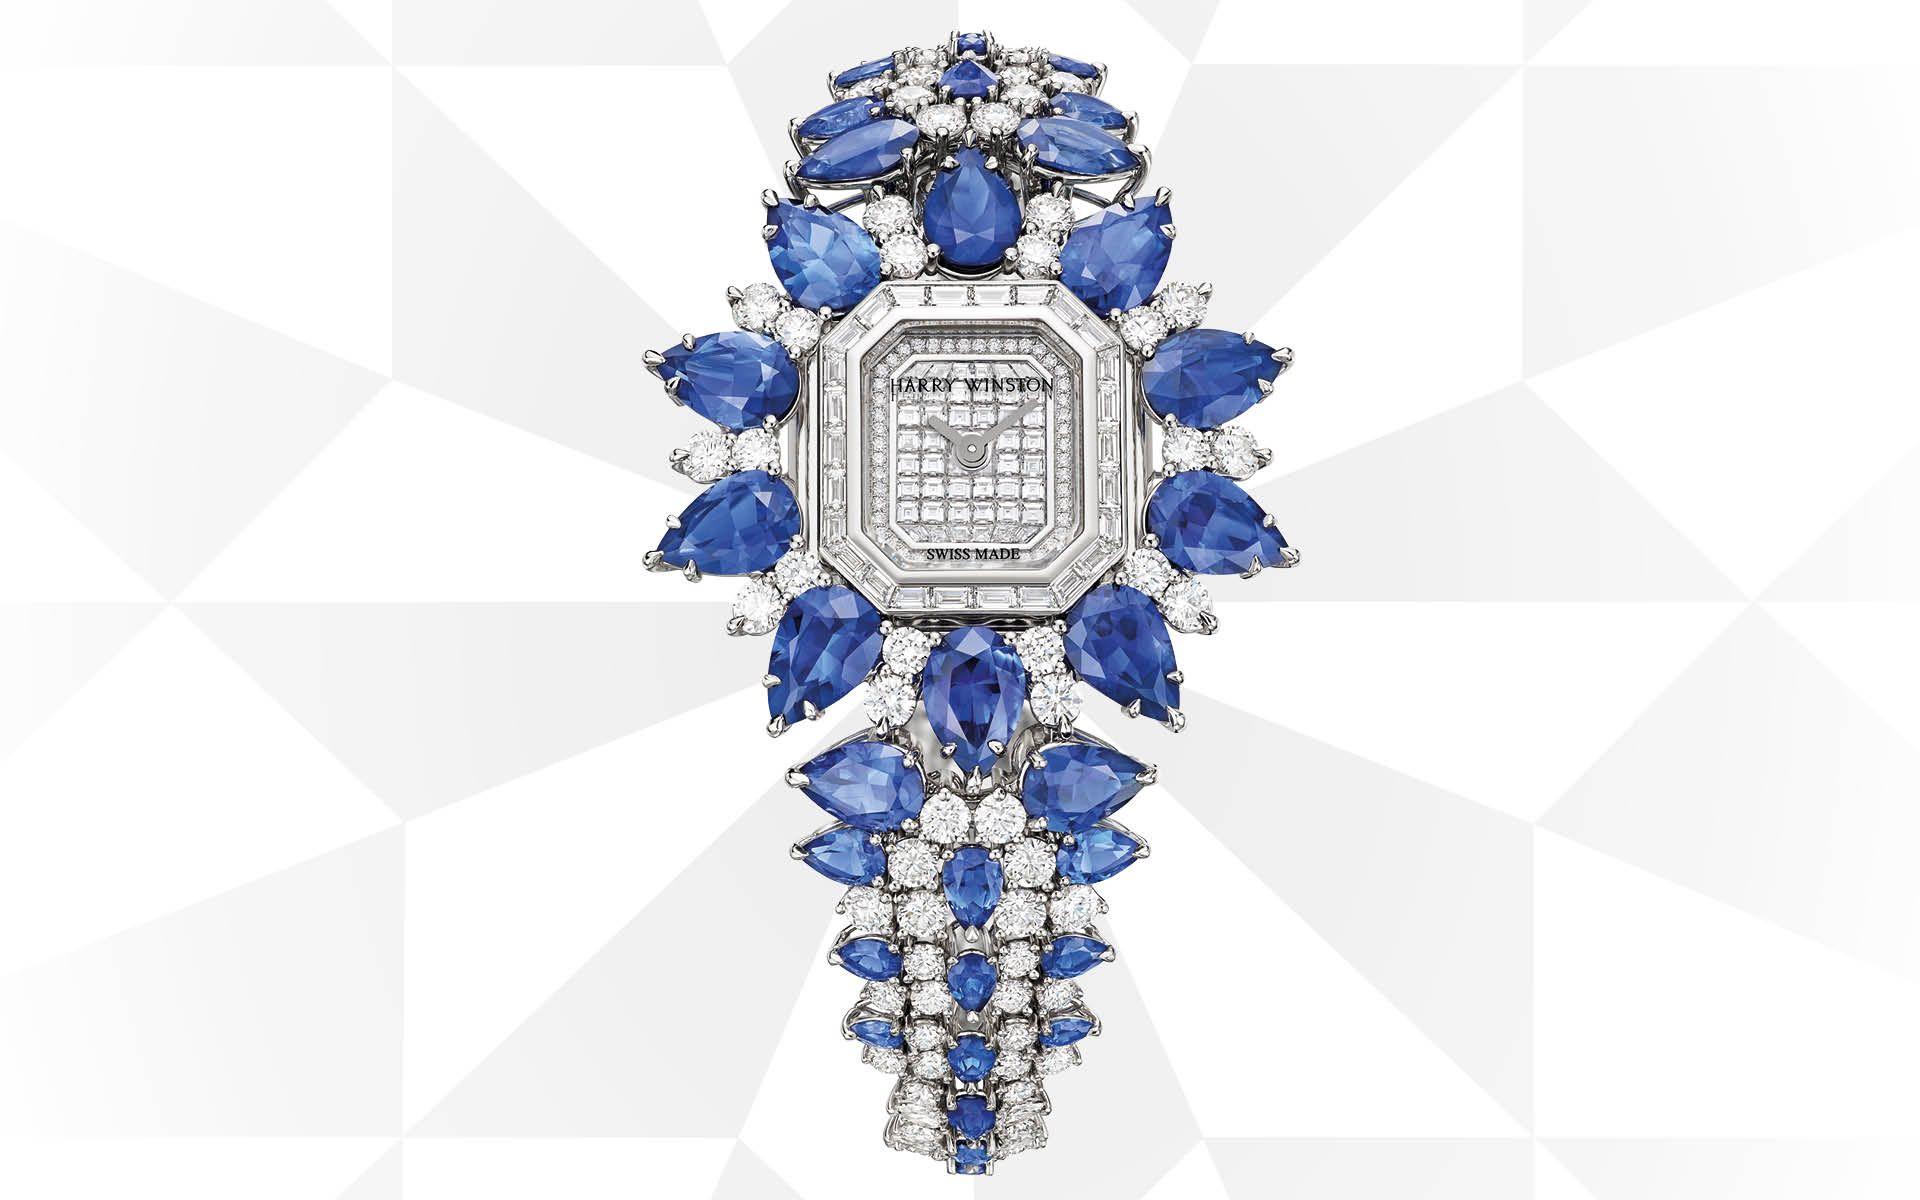 10 Jewellery Pieces With Stunning Geometric Design